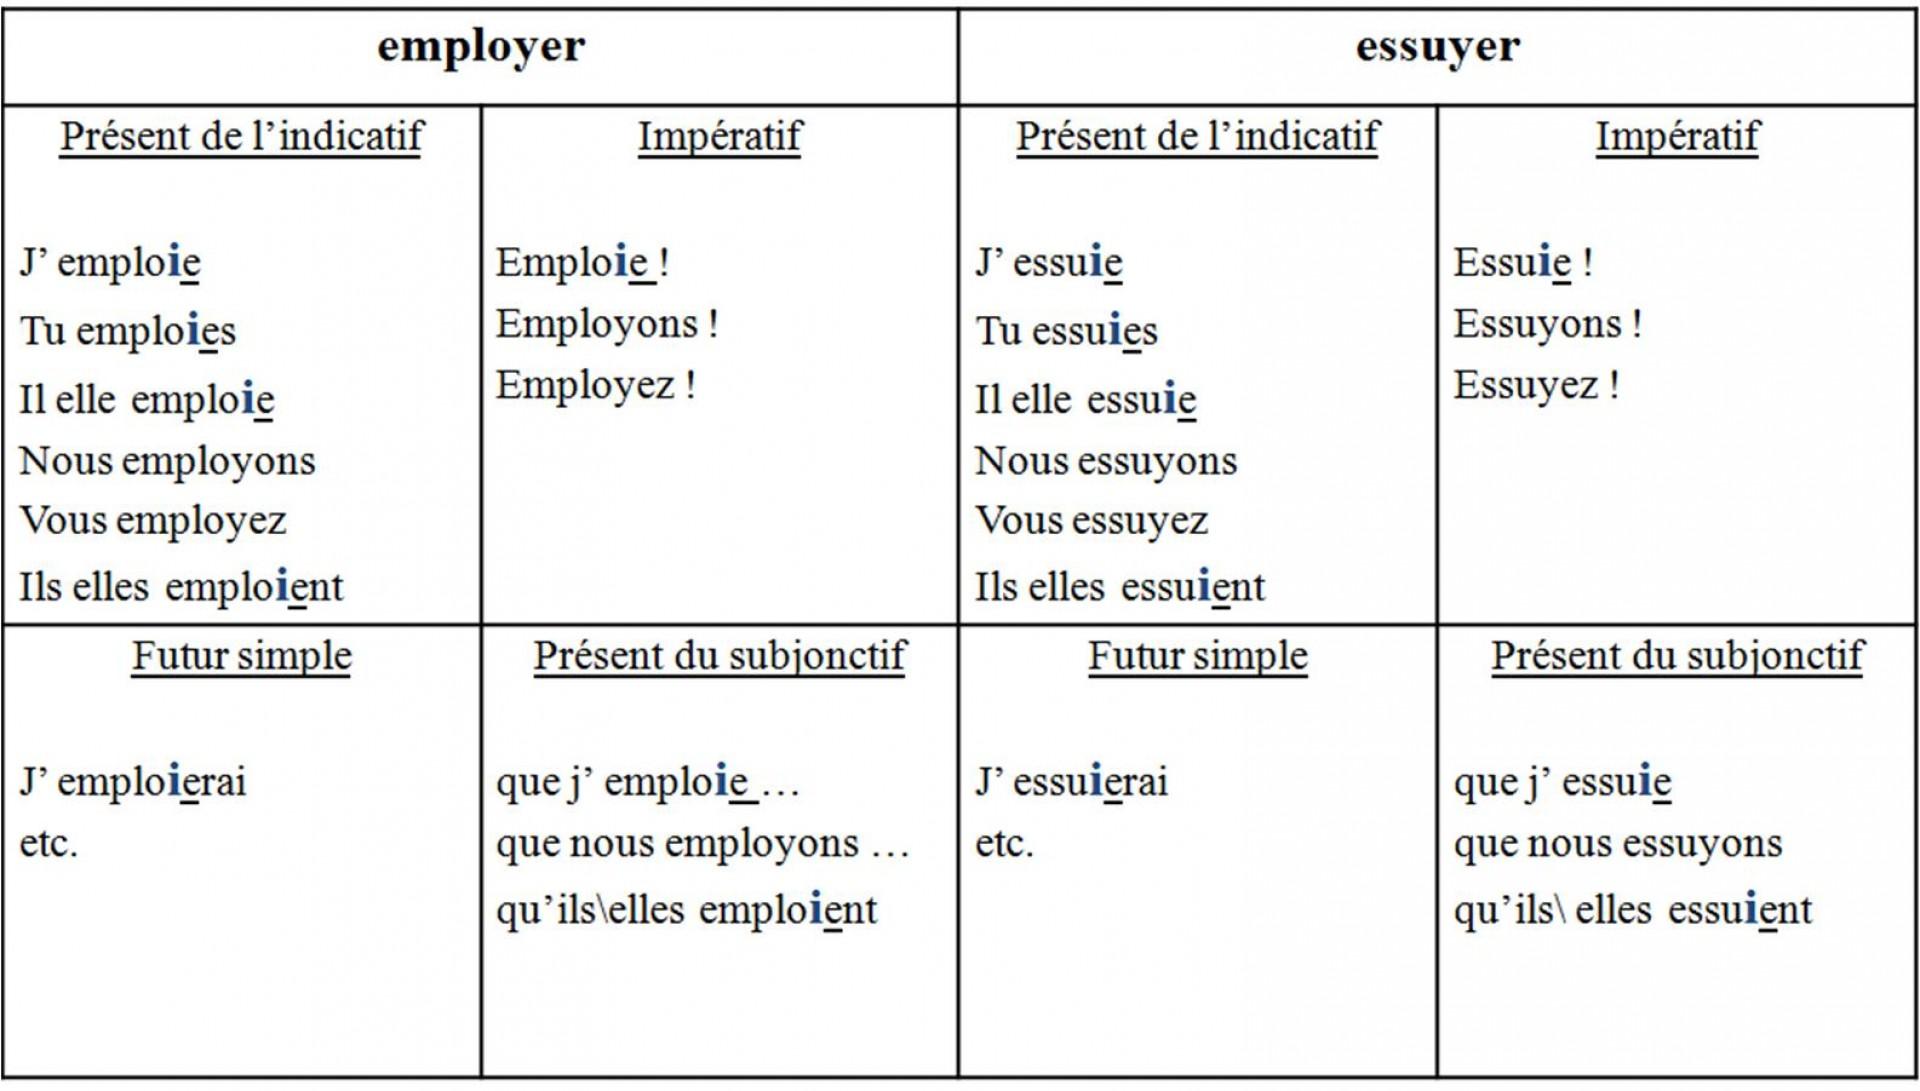 019 Essayer Conjugation French Essay Example Breathtaking Future Verb Past 1920